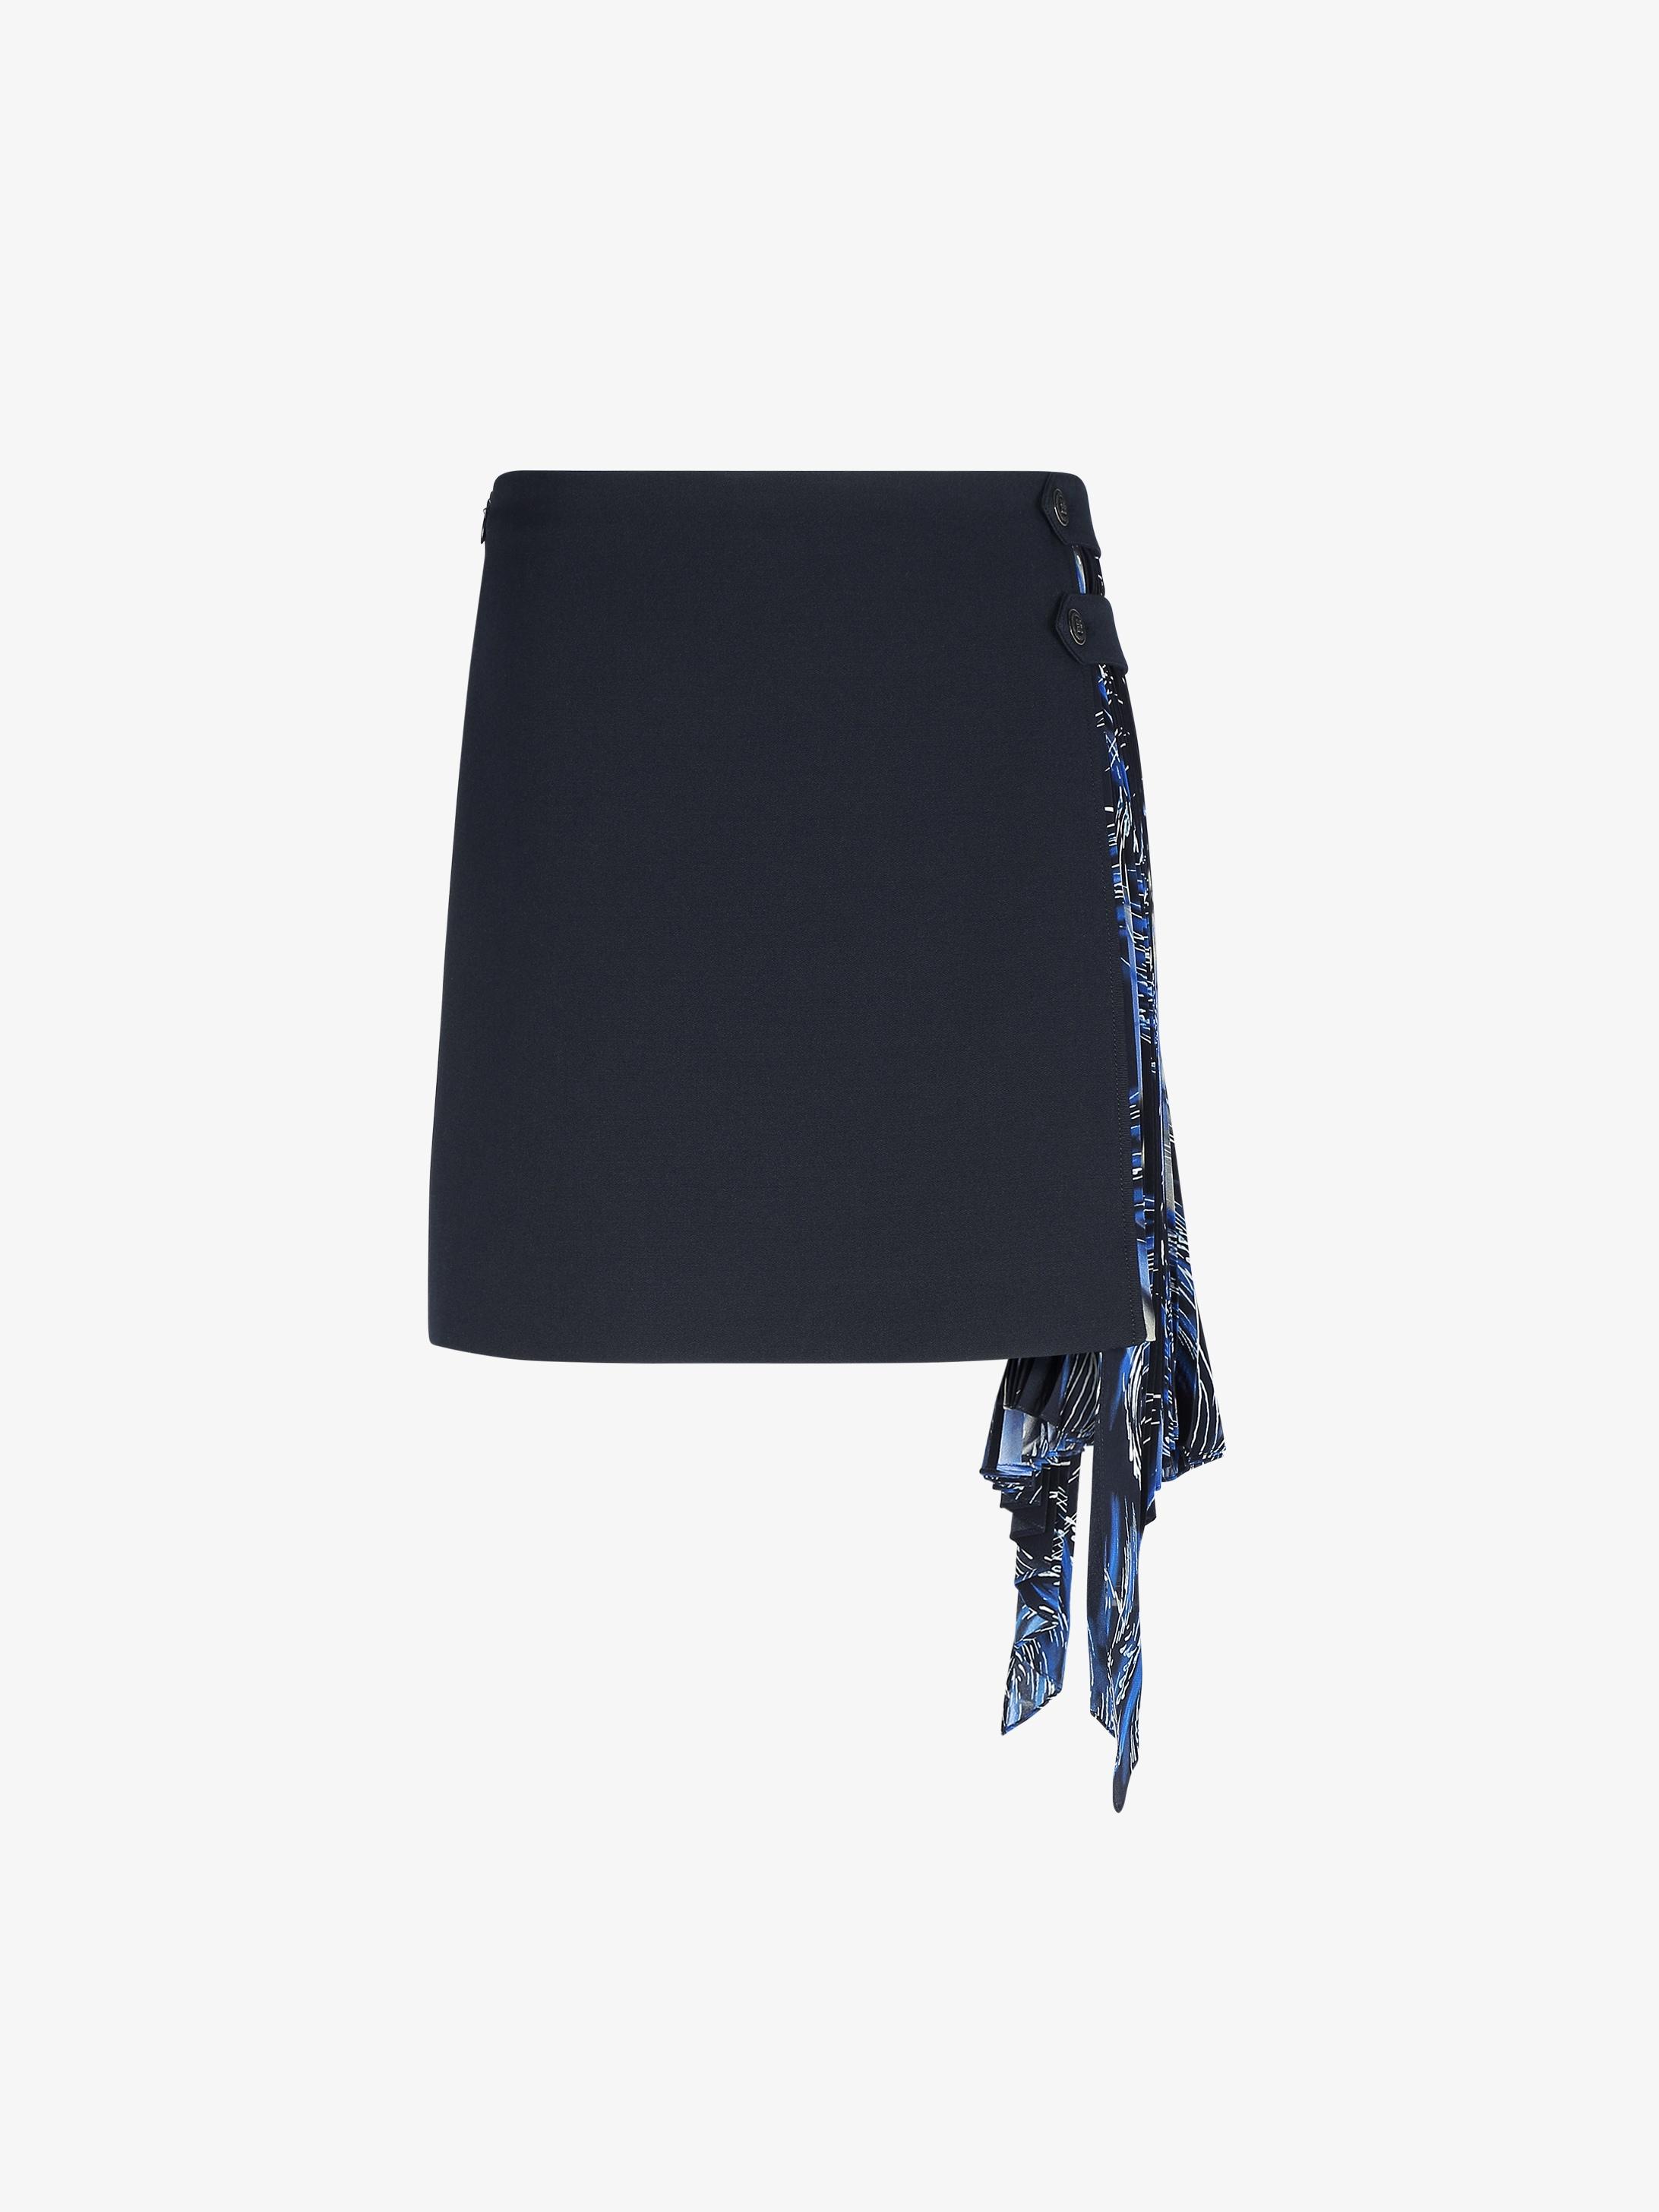 Waves printed flared and pleated mini skirt